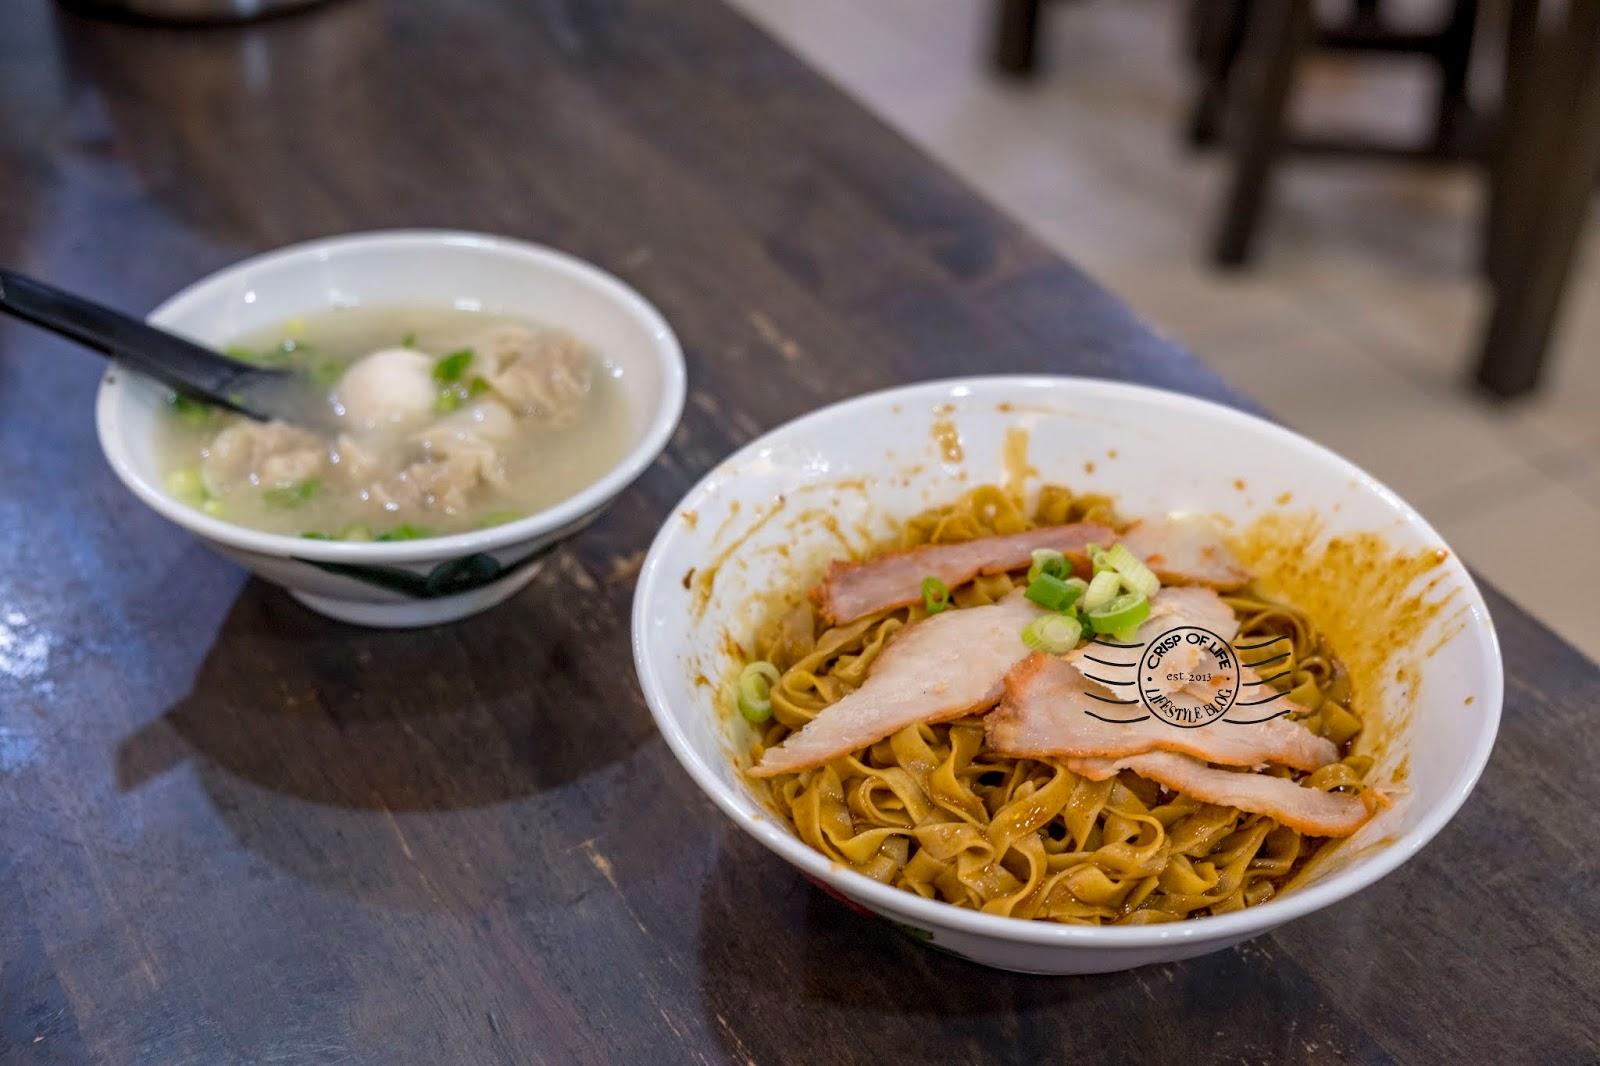 Chan SinKee Pontian Mee 陳新記笨珍雲吞麵 at Sunway Damansara, Petaling Jaya, Selangor